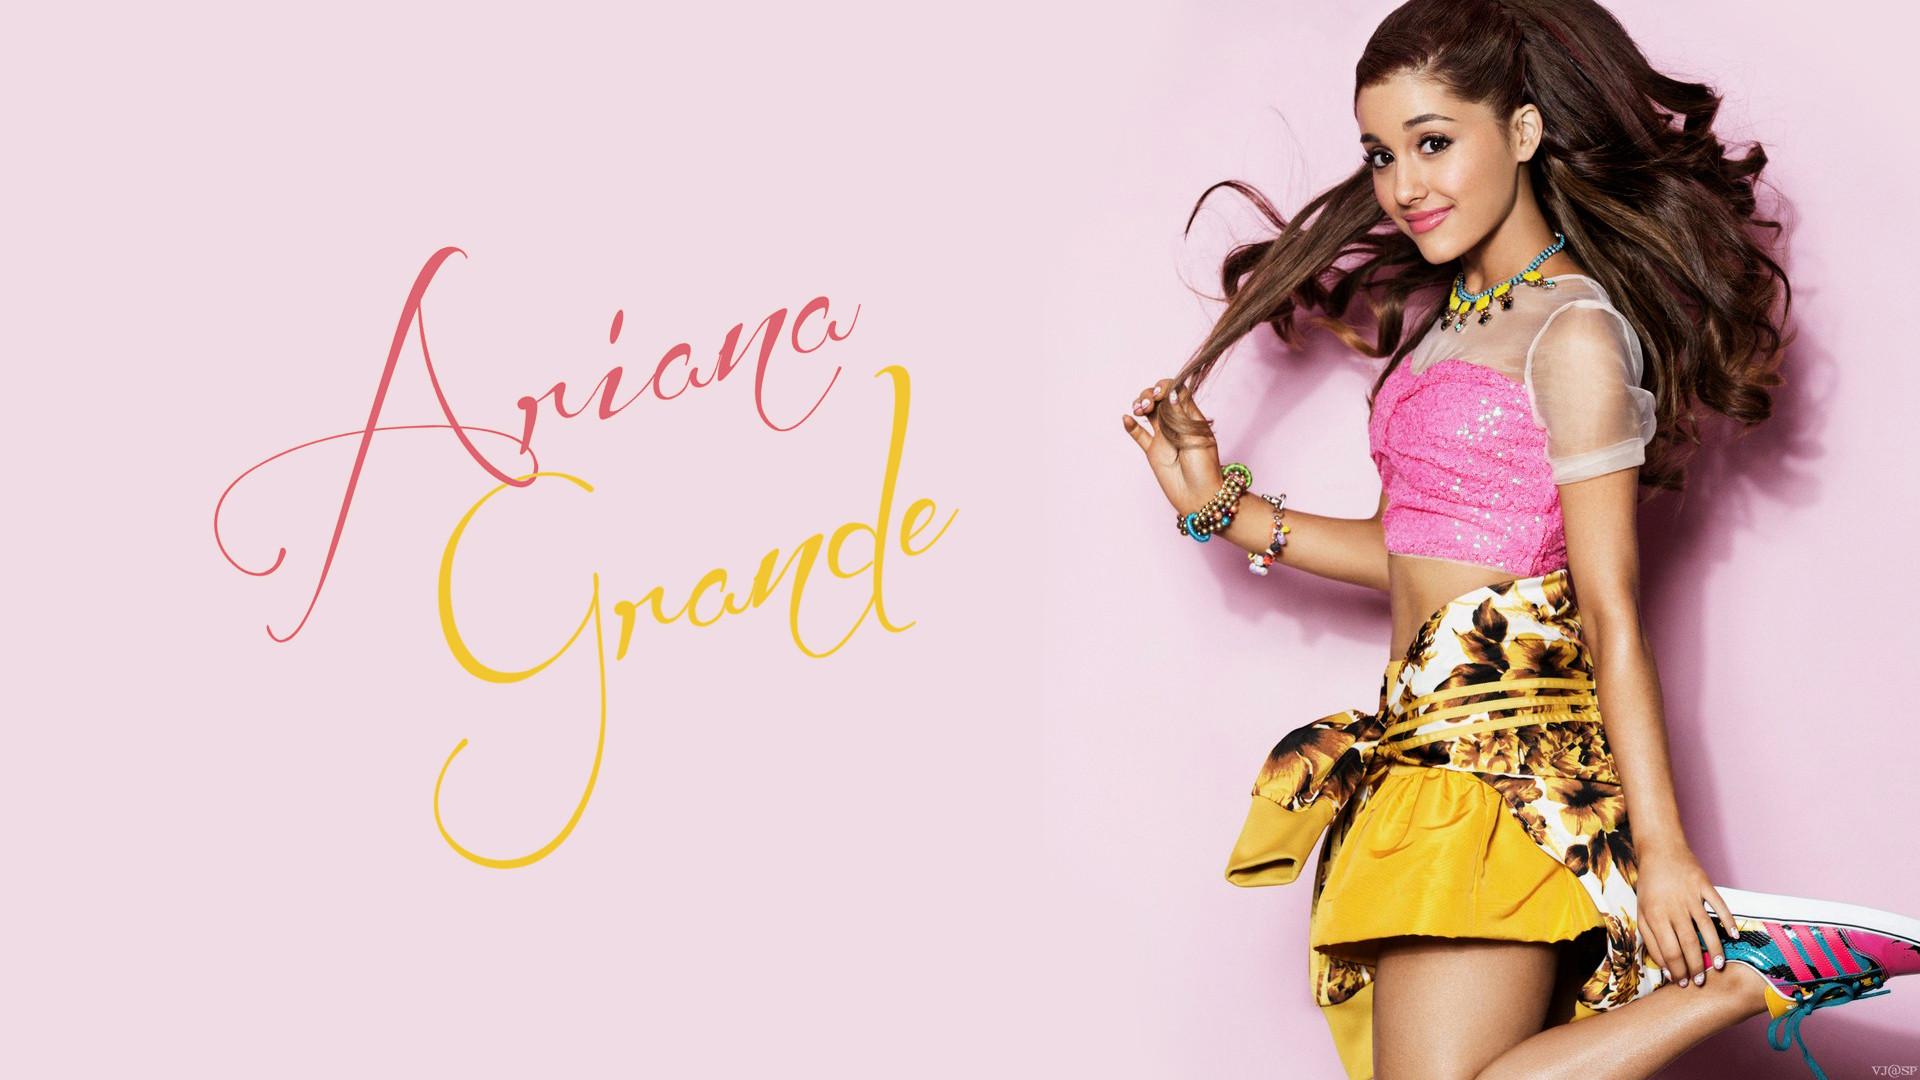 Ariana Grande Wallpapers ID782612